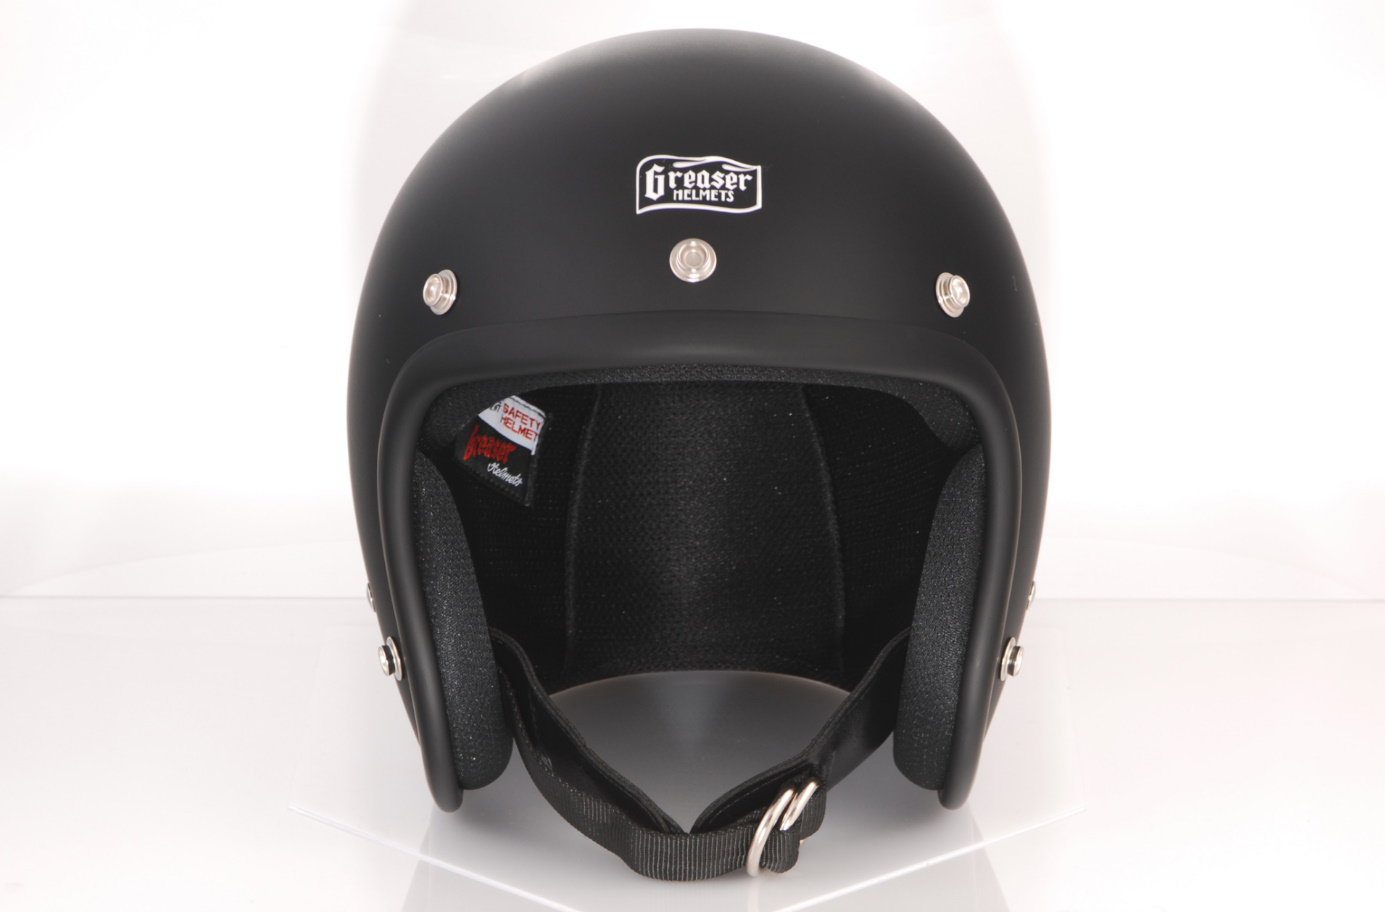 GREASER 60's PLAIN ジェットヘルメット マットブラック M(57cm~58cm) GREASER(グリーサー)